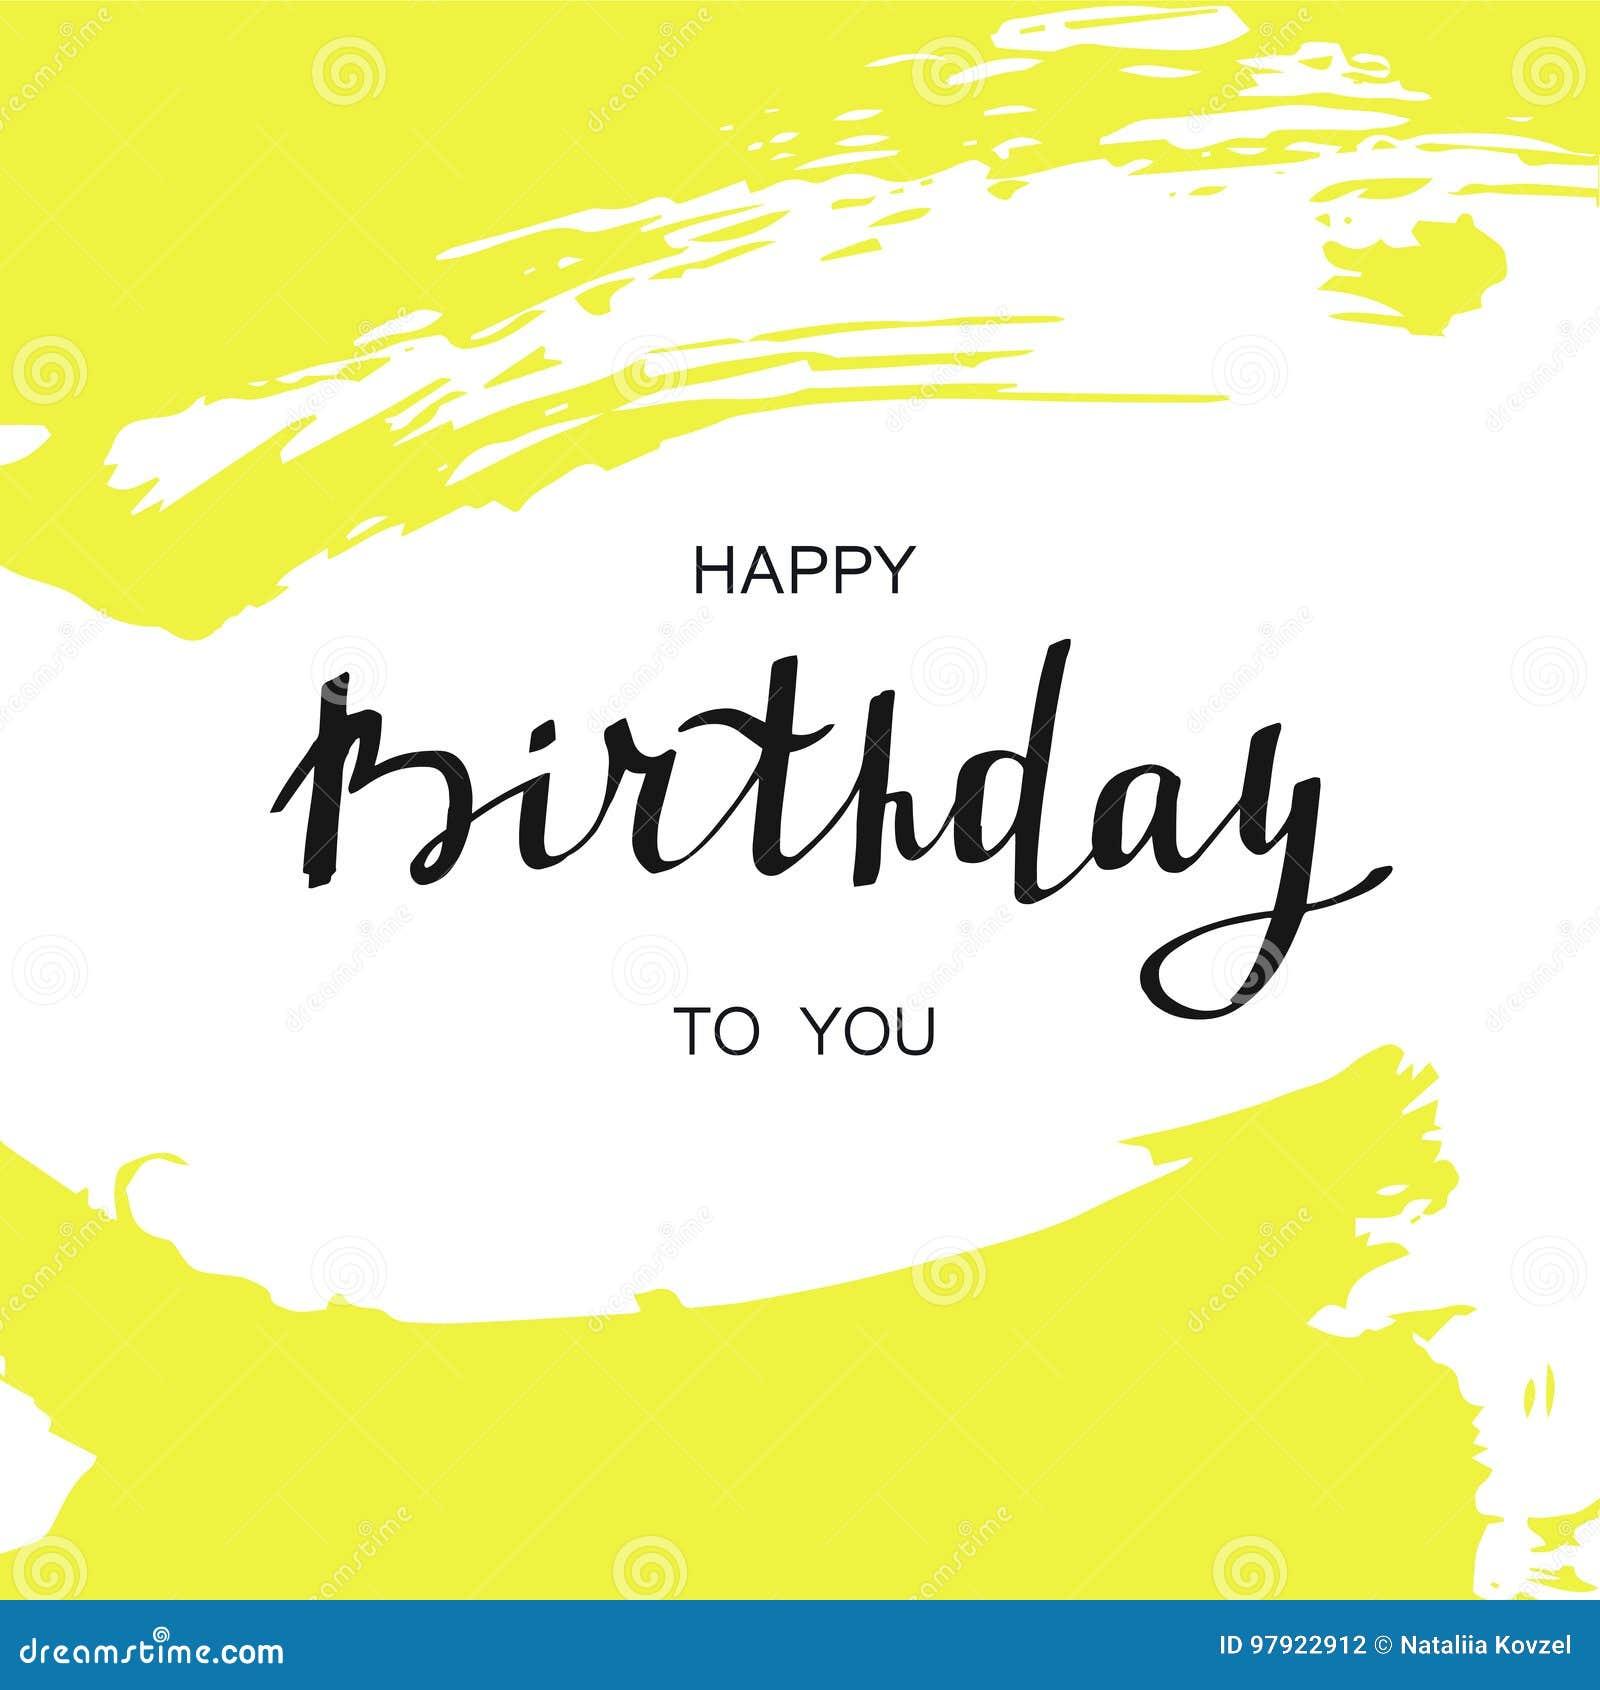 Happy Birthday Card. Handwritten Text On Abstract Yellow